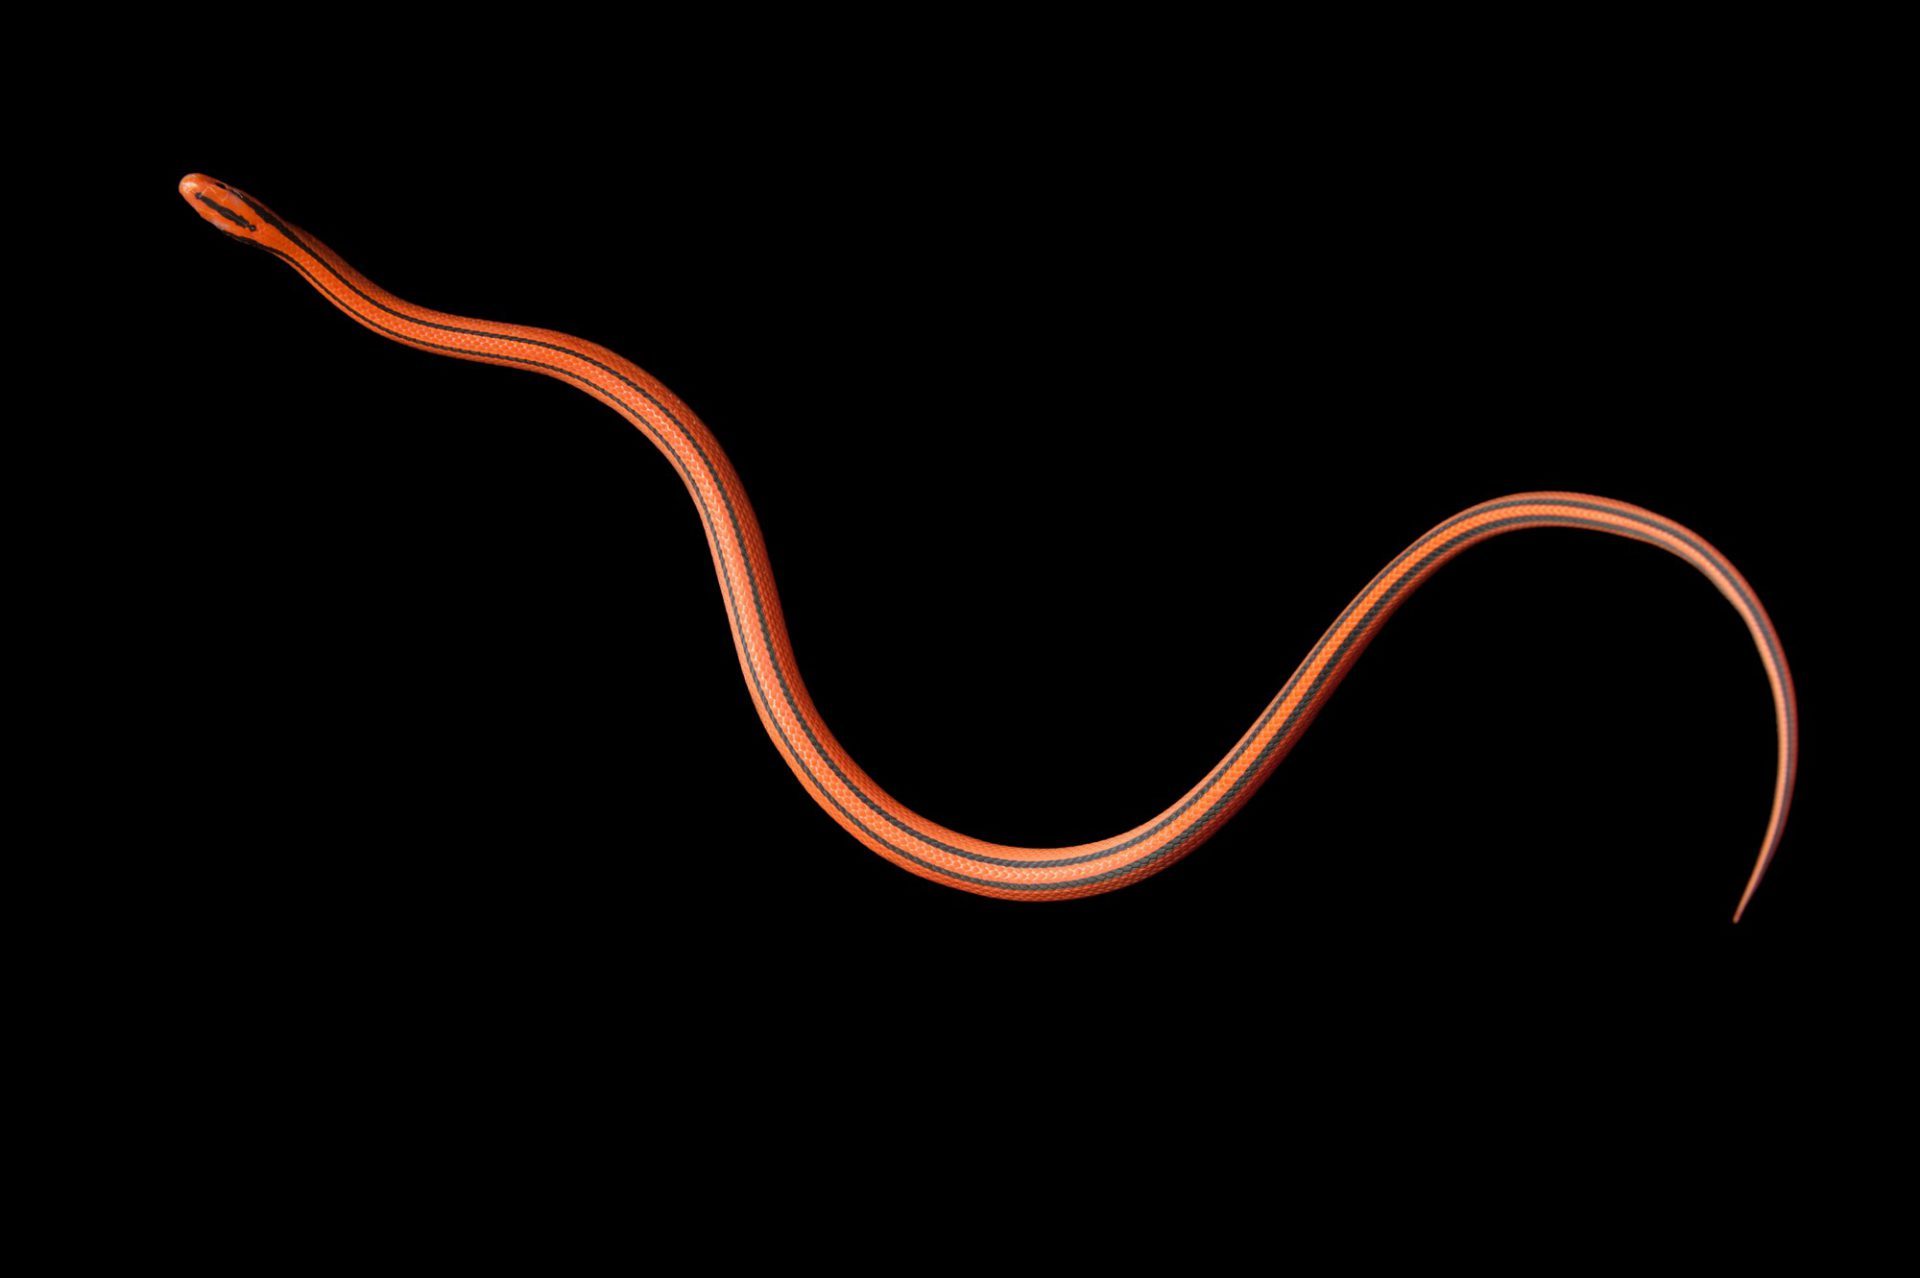 Photo: A Thai bamboo rat snake (Elaphe porphyracea coxi) at Miller Park Zoo.